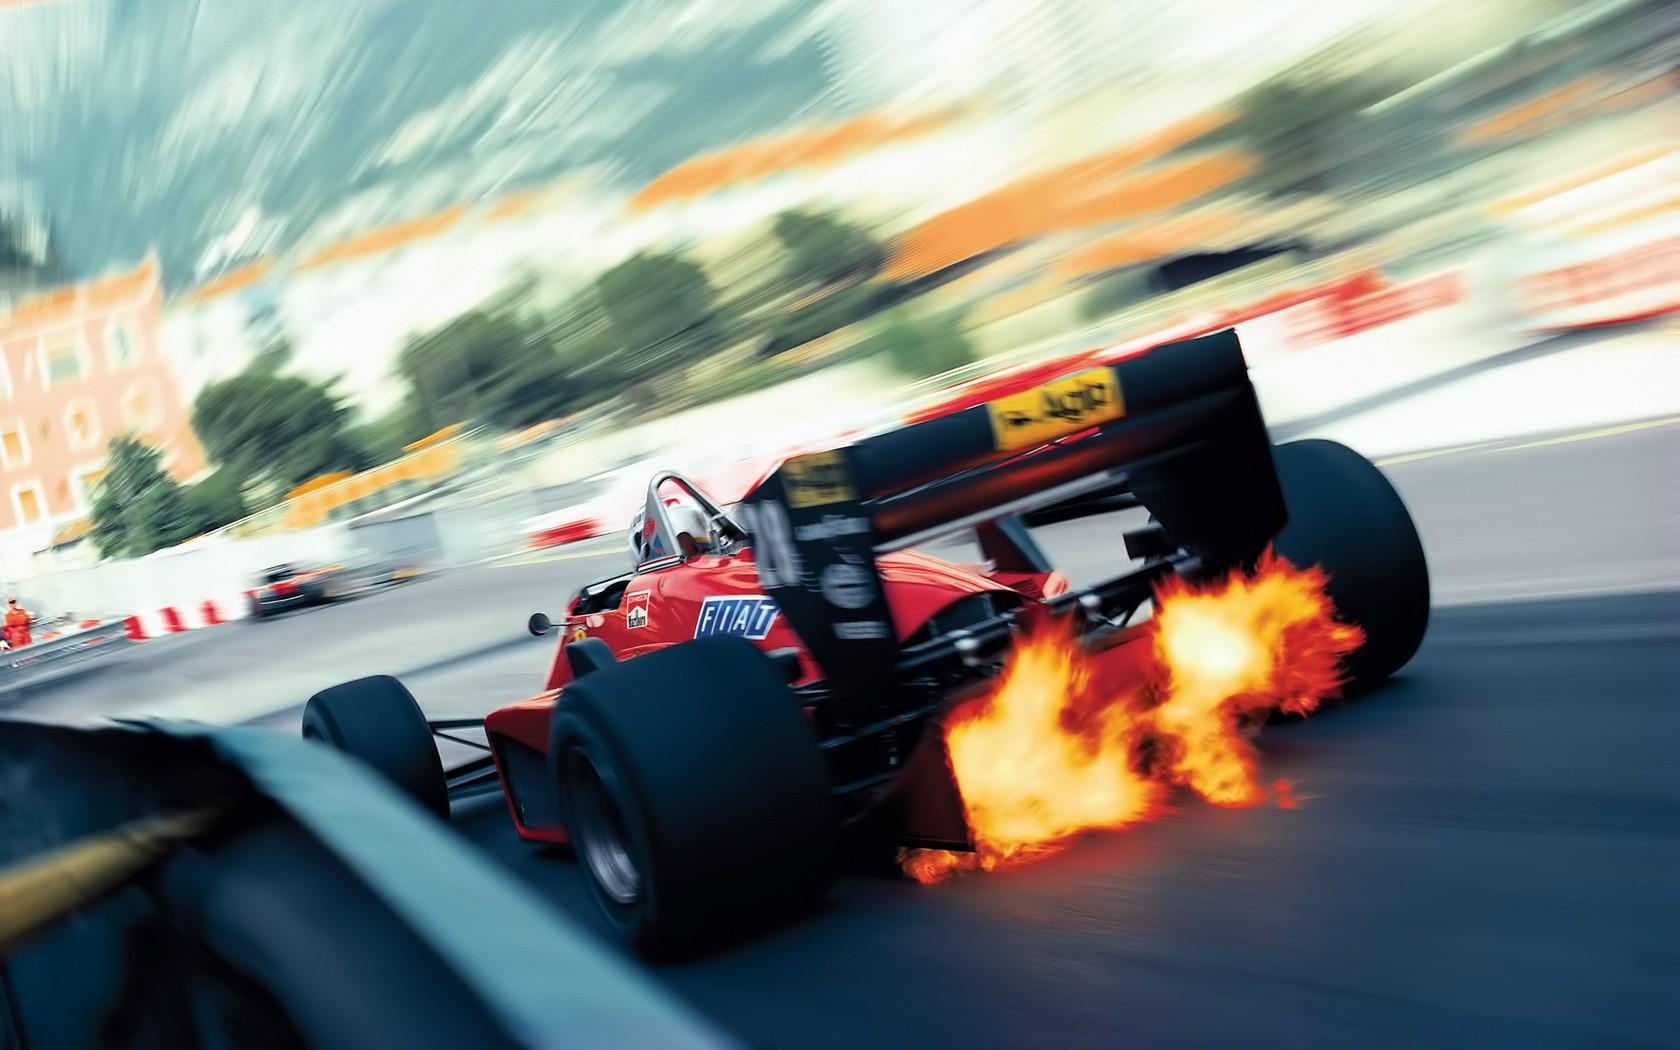 Wallpaper : Blurred, Vintage, Formula 1, Sports Car, Ferrari, Driving,  Performance Car, Screenshot, Motorsport, 1680x1050 Px, Computer Wallpaper,  ...